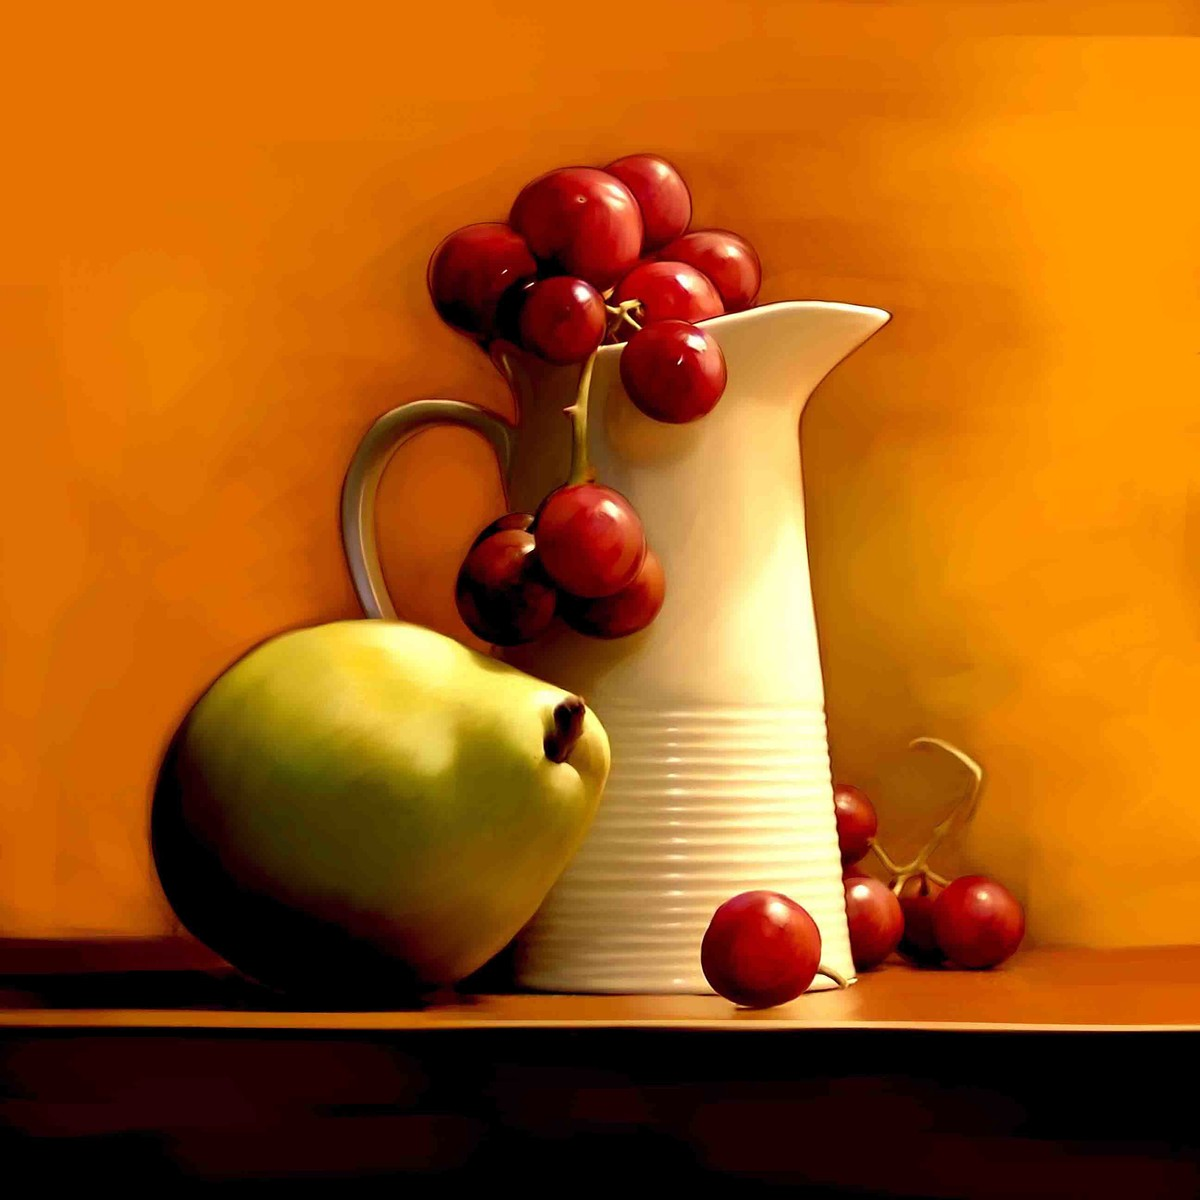 Still Life with pear Digital Print by The Print Studio,Digital